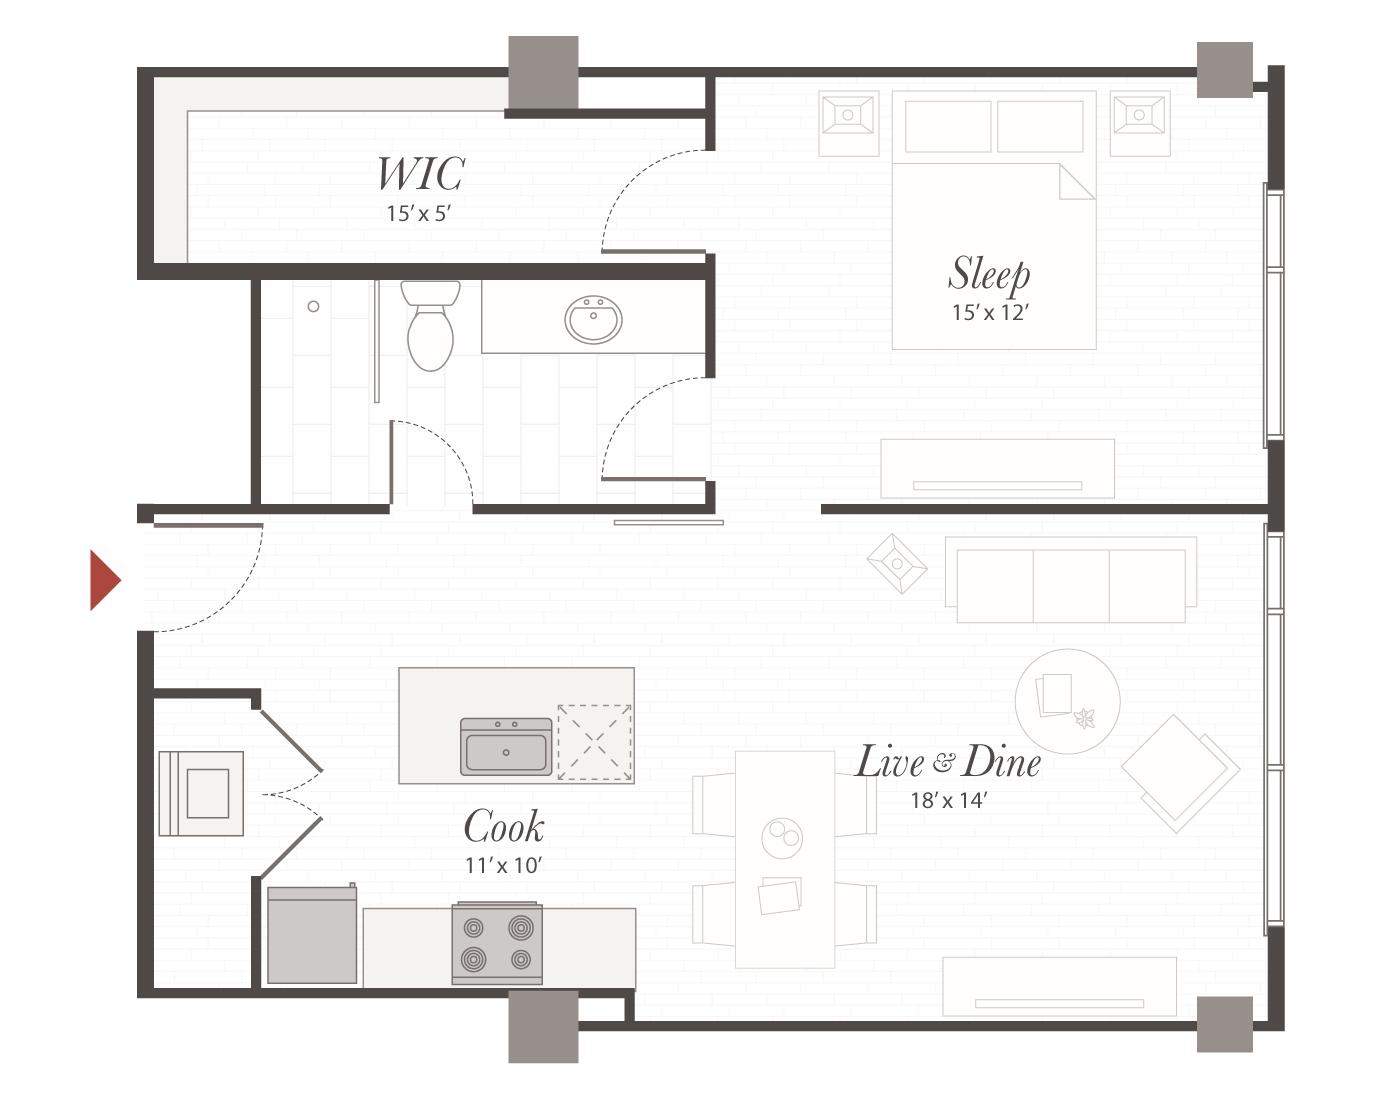 1 Bedroom Luxury Apartment Floor Plans Floor Plan Ideas